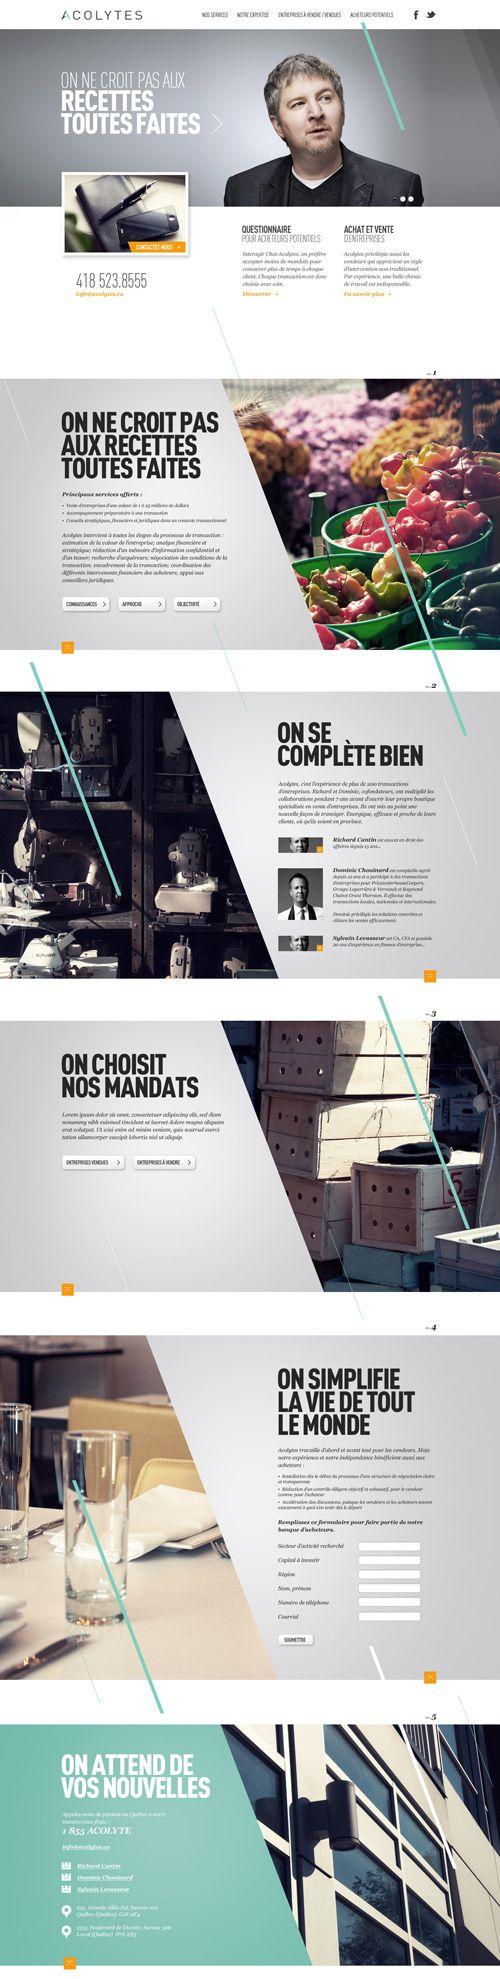 Acolytes by Alexandre Desjardins, via Behance web design